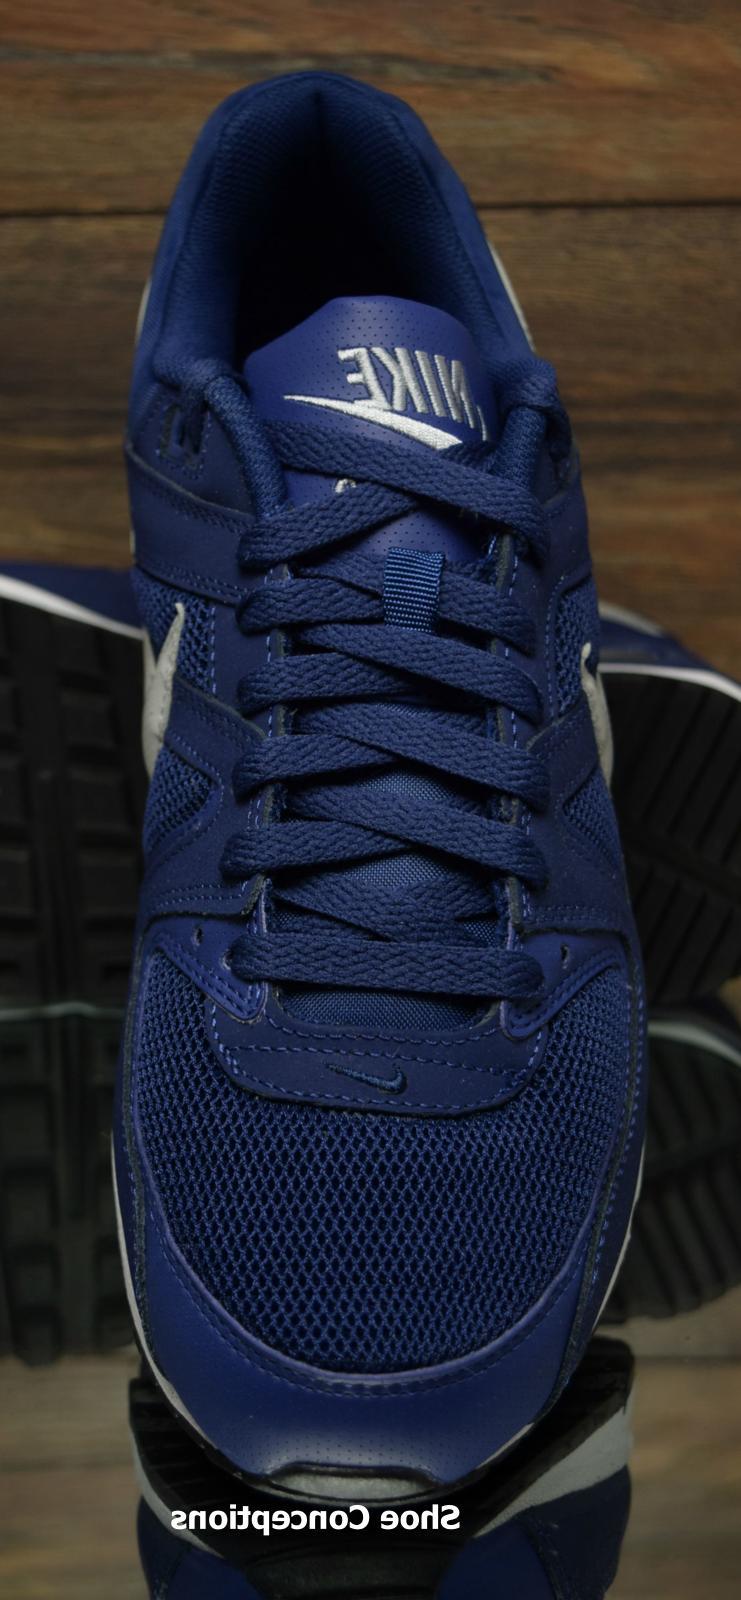 Nike Blue 629993-402 Shoes Multi Size